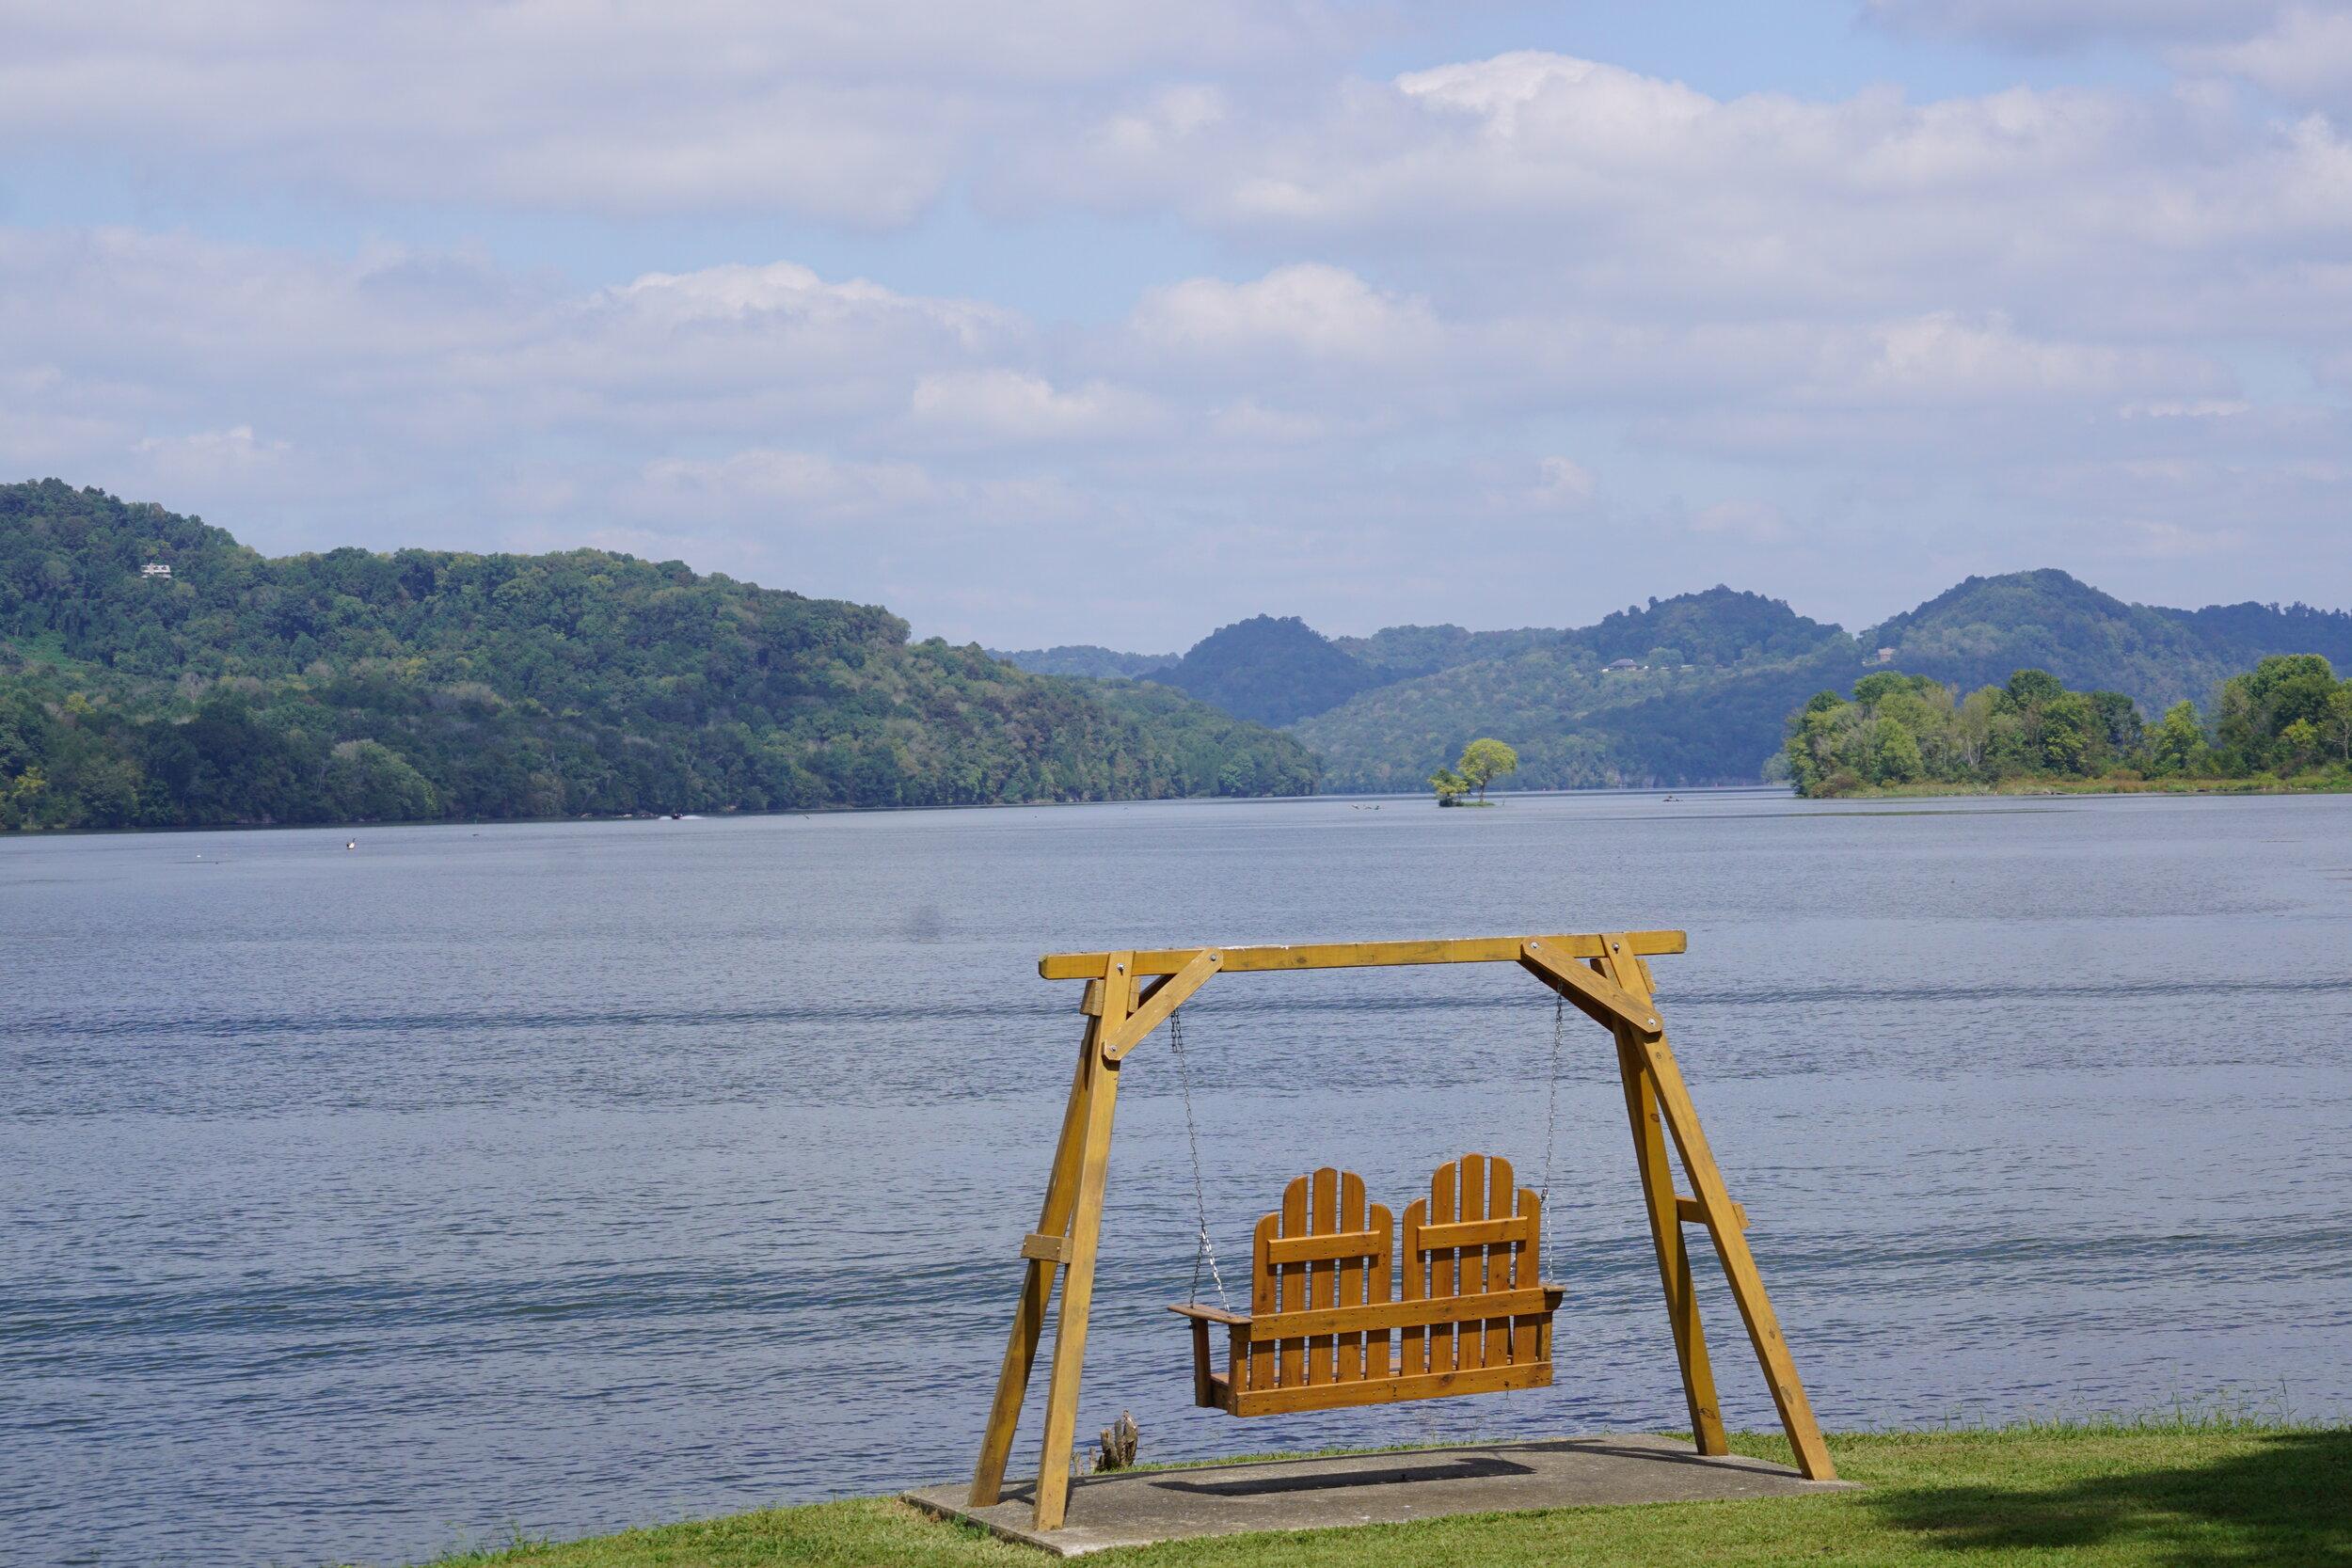 Veterans Park in Granville provides great views of Cordell Hull Lake (Cumberland River).